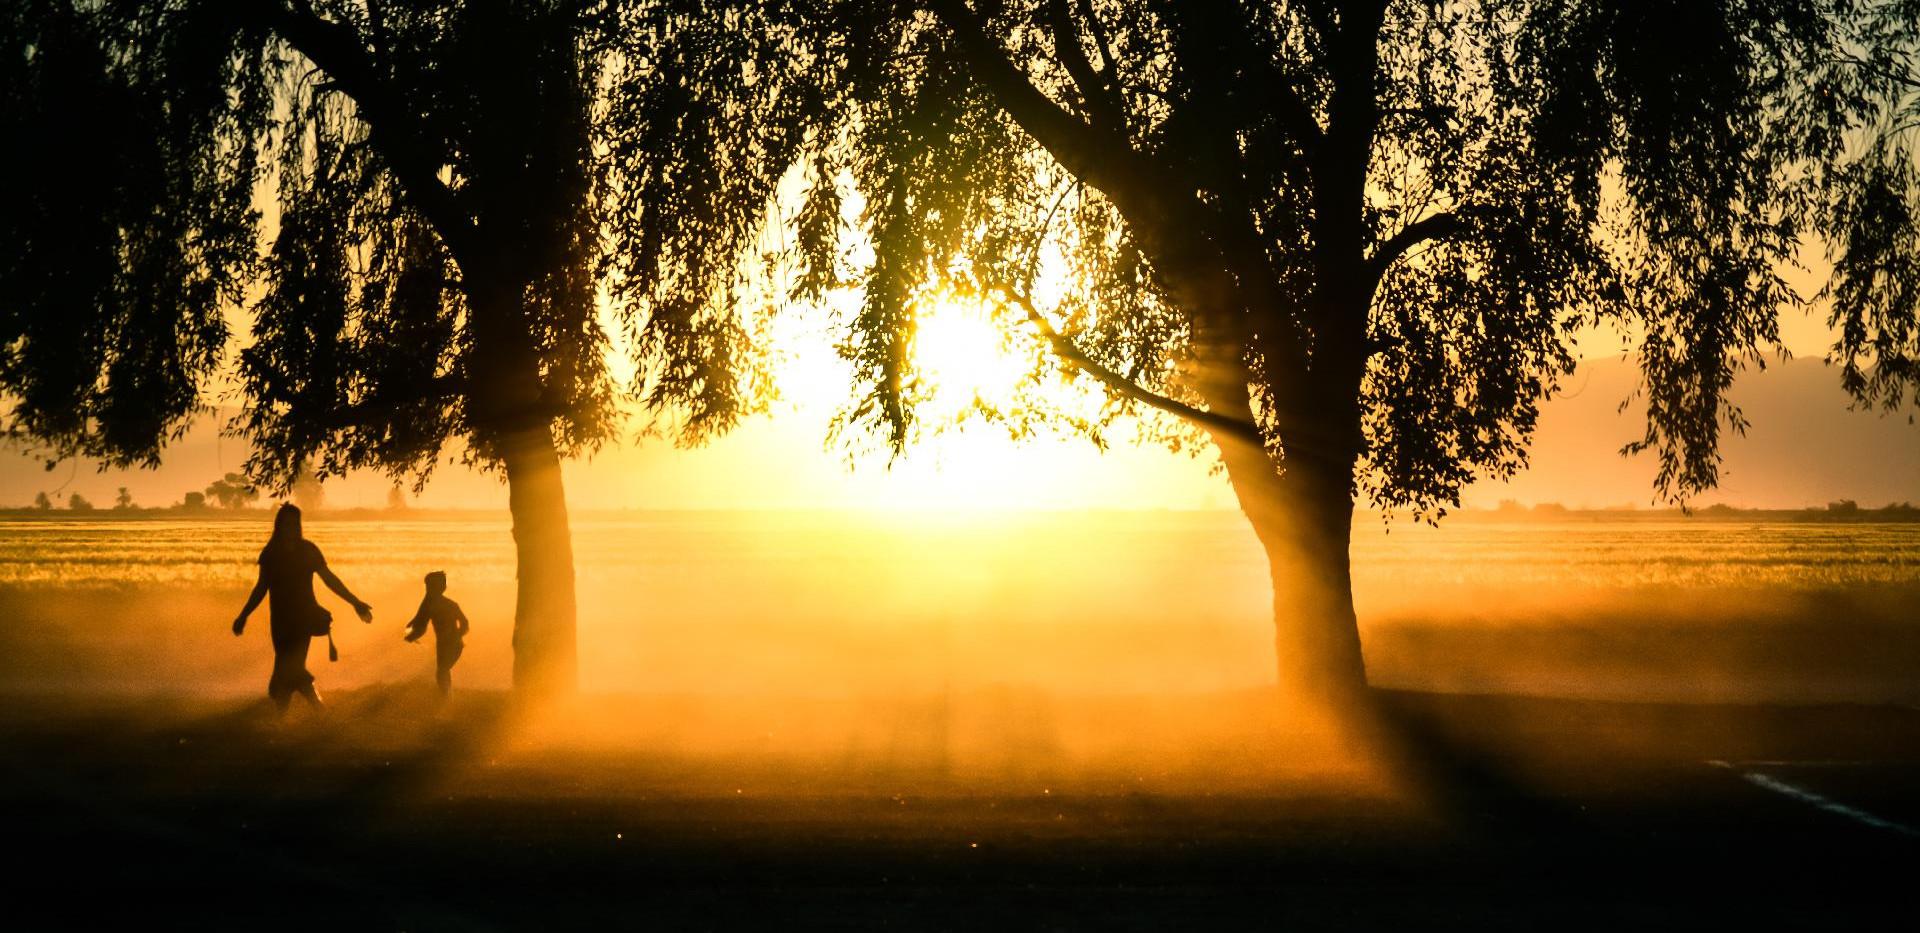 jumpstory-ZED trees sun-071622.jpg